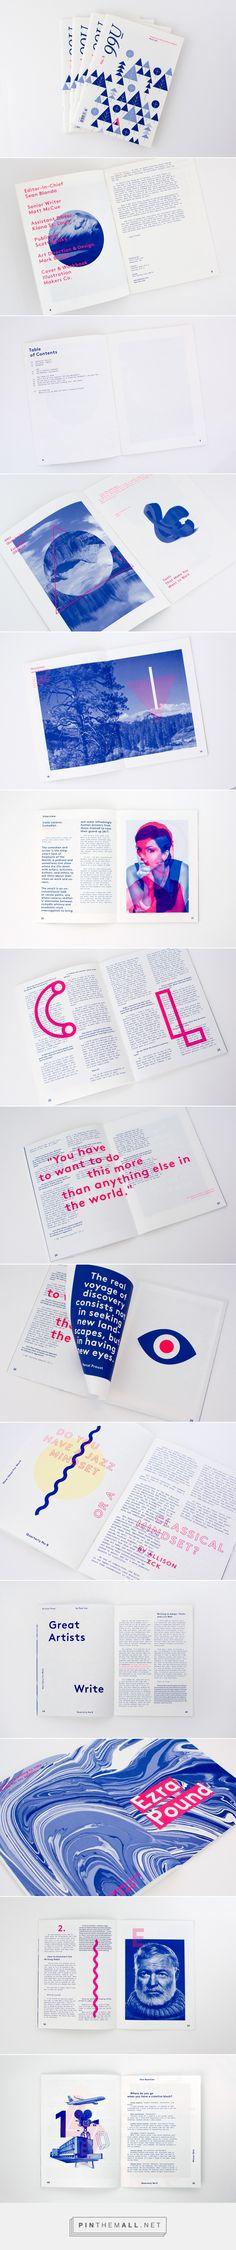 99U Quarterly — Issue 8